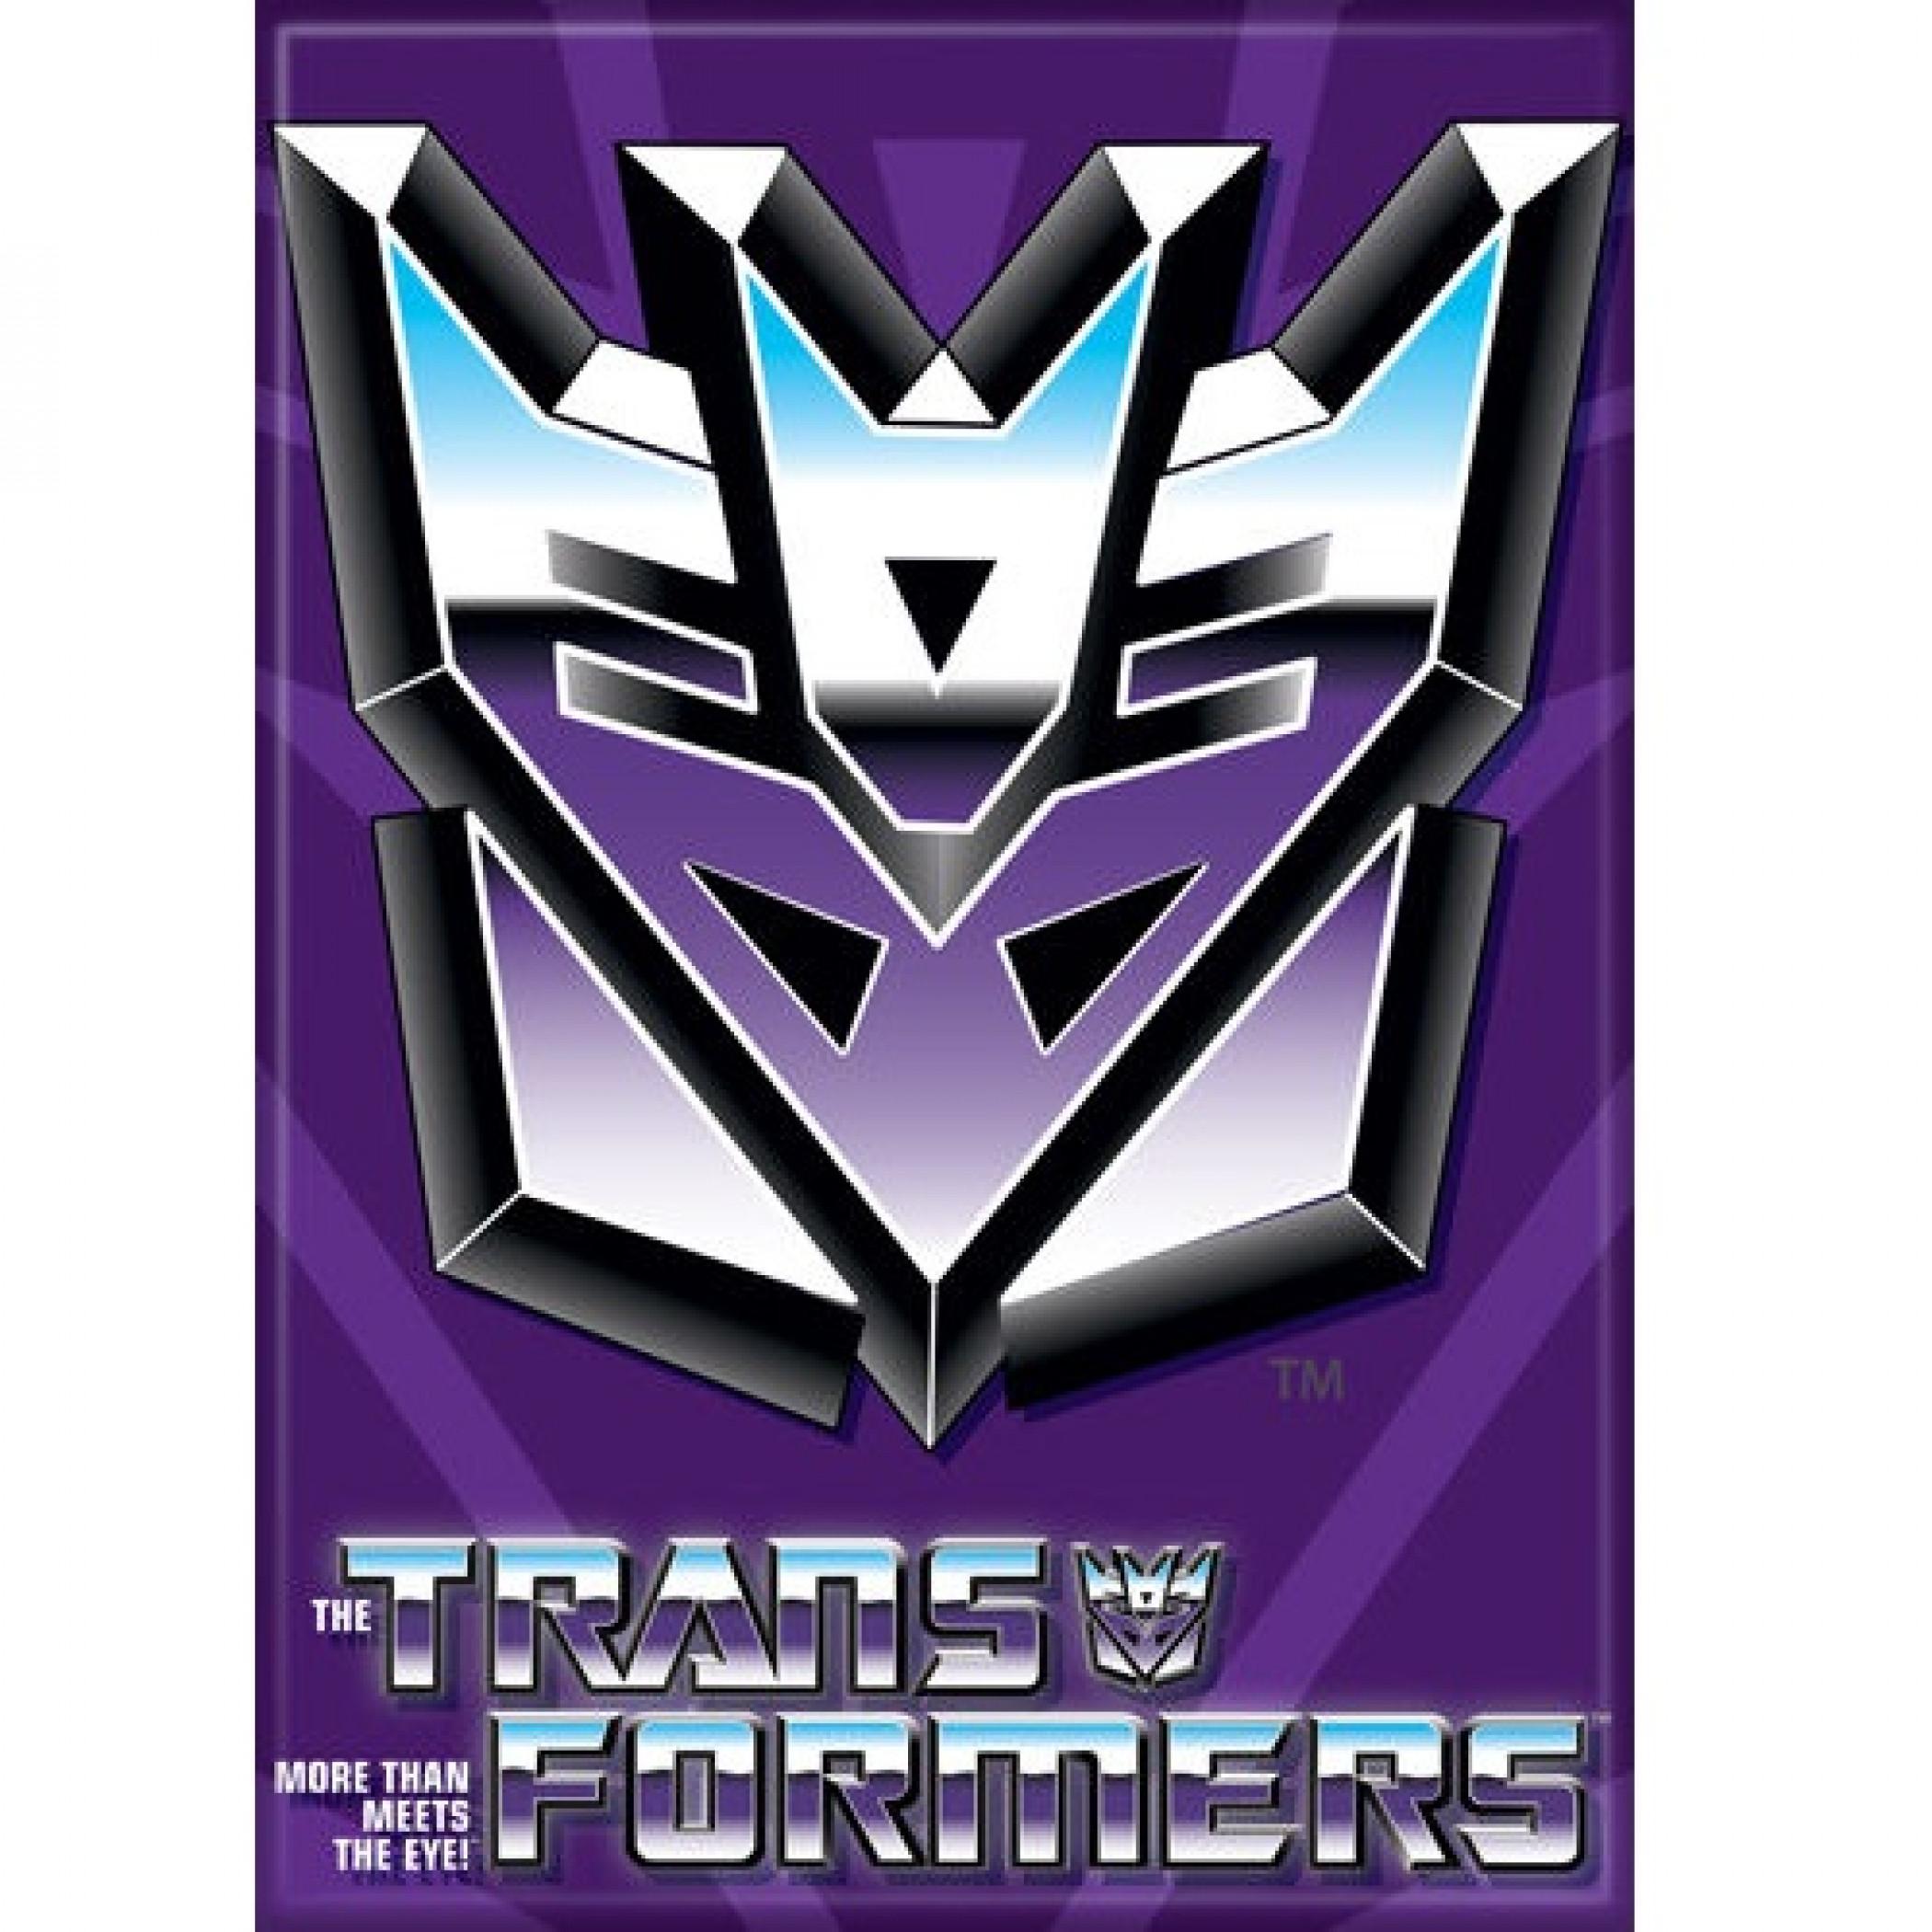 The Transformers Decepticons Logo Magnet